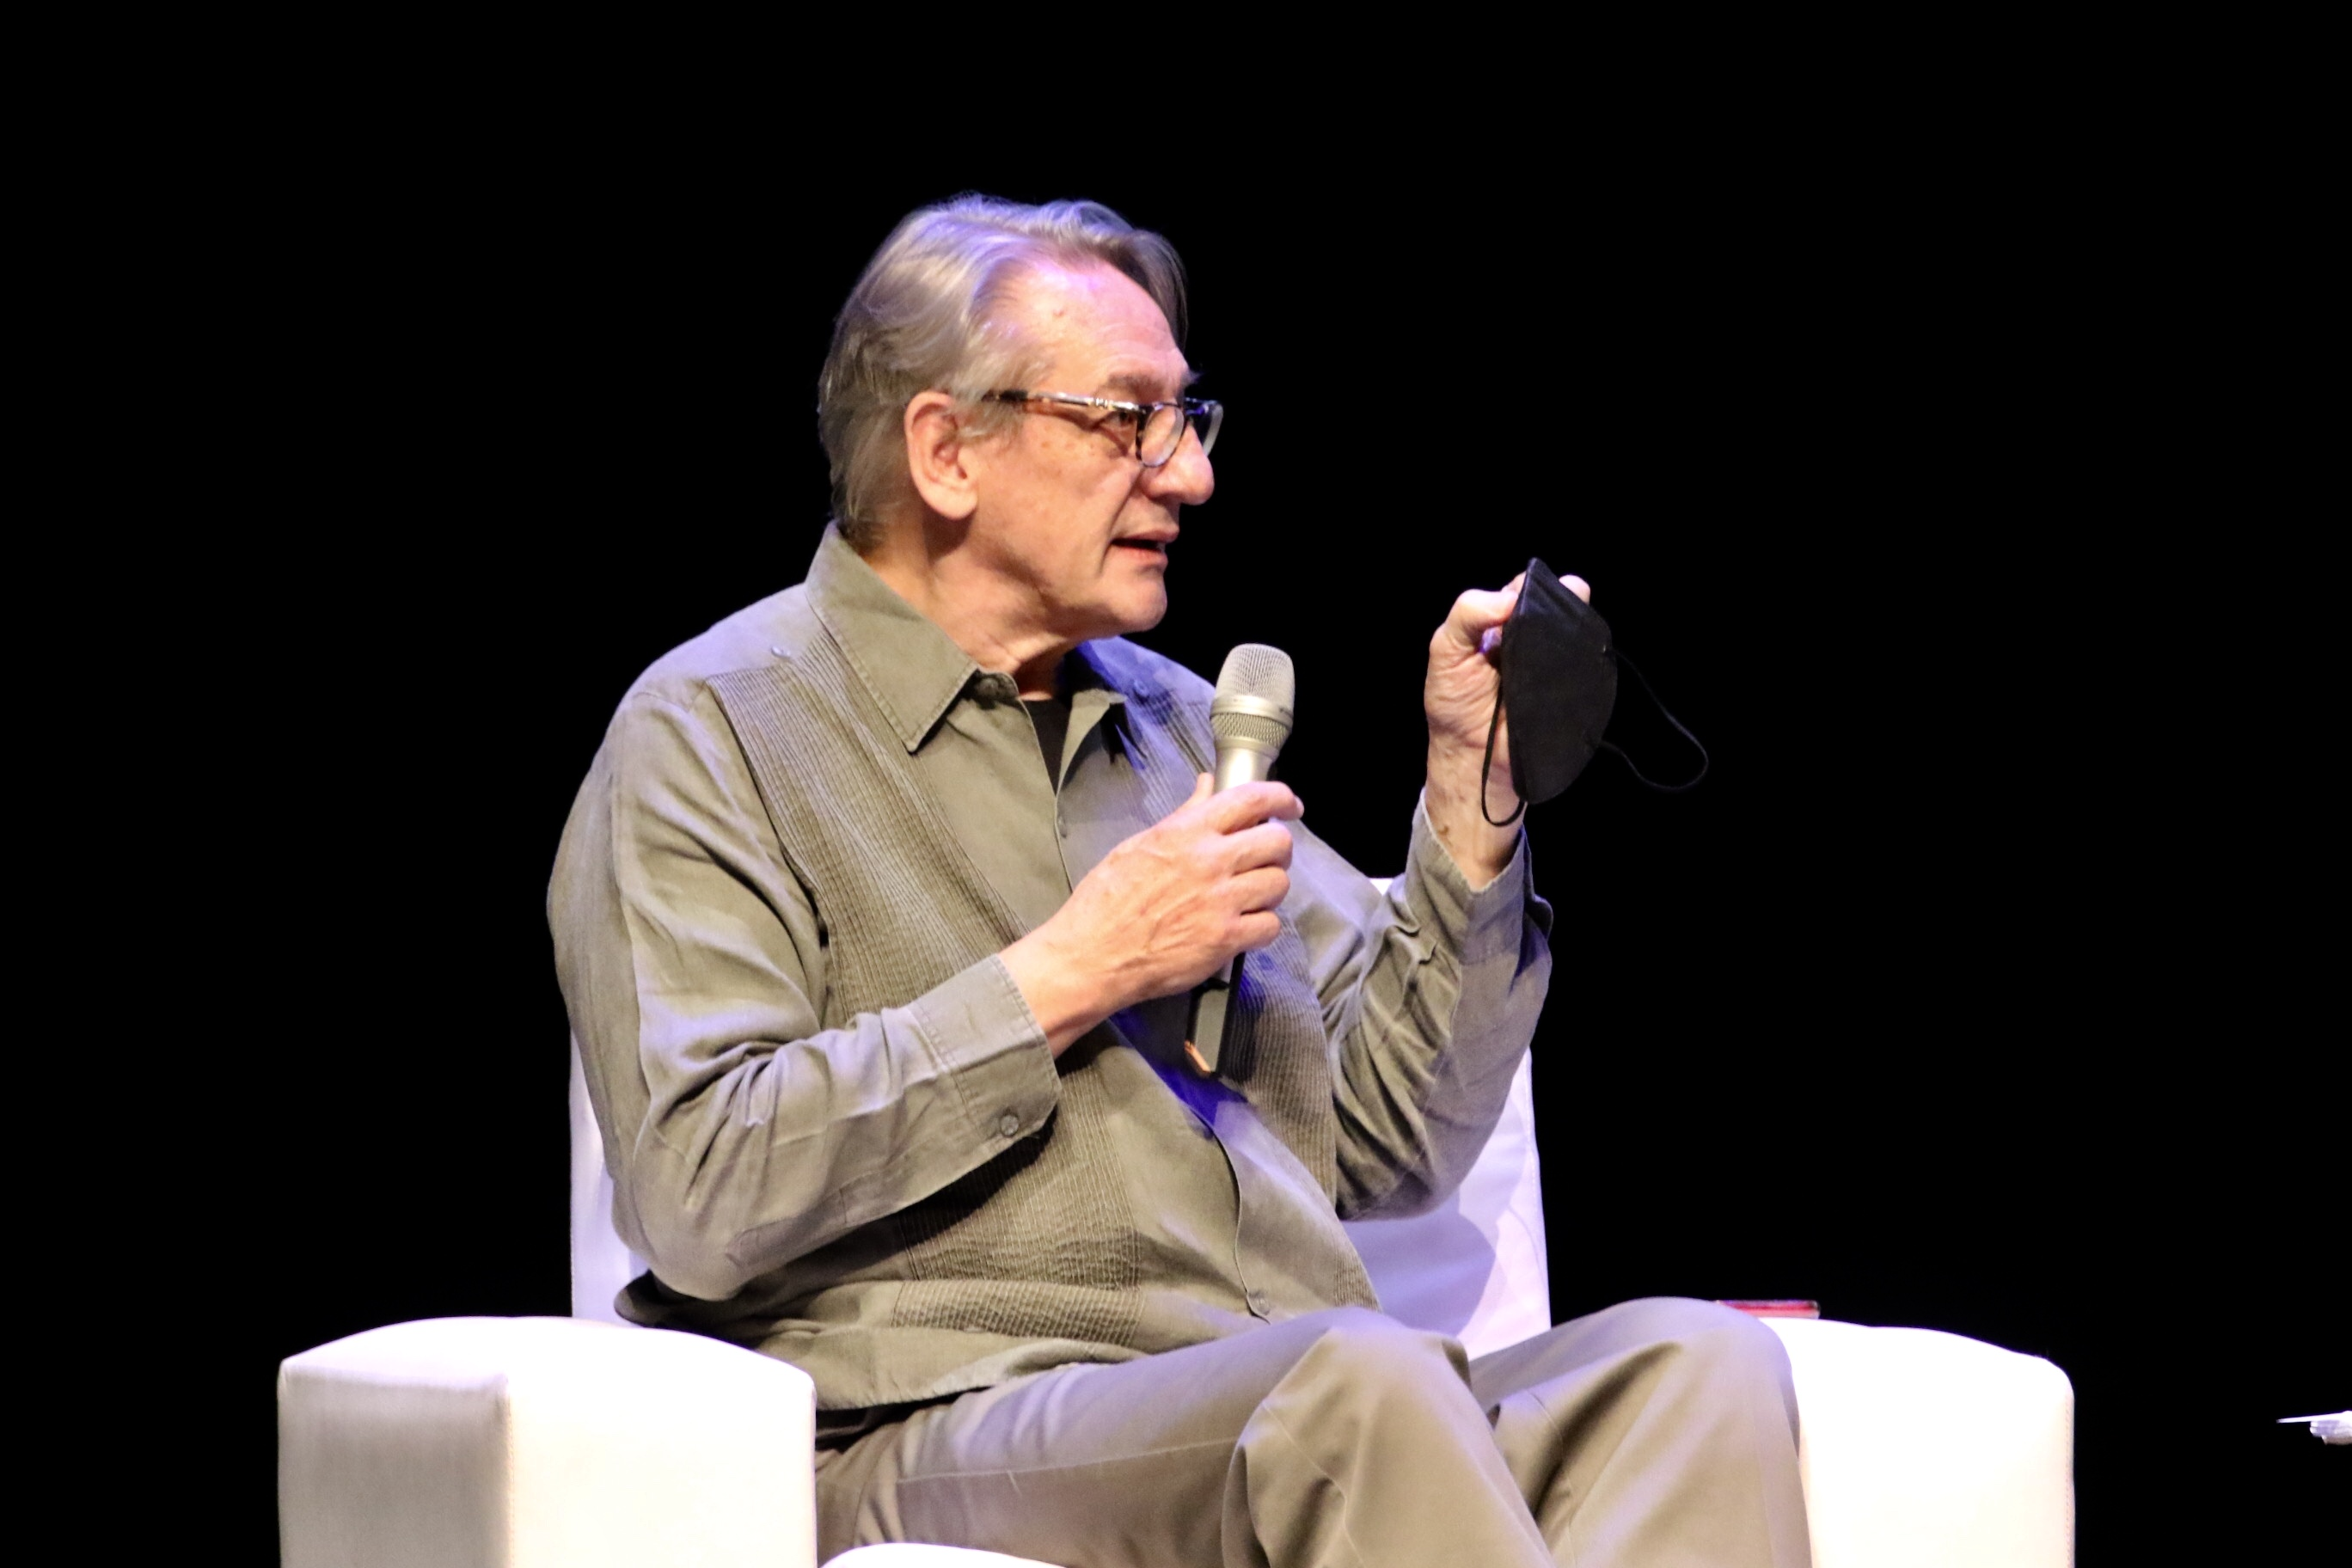 Continúa IV Bienal de Novela Mario Vargas Llosa, en la UdeG